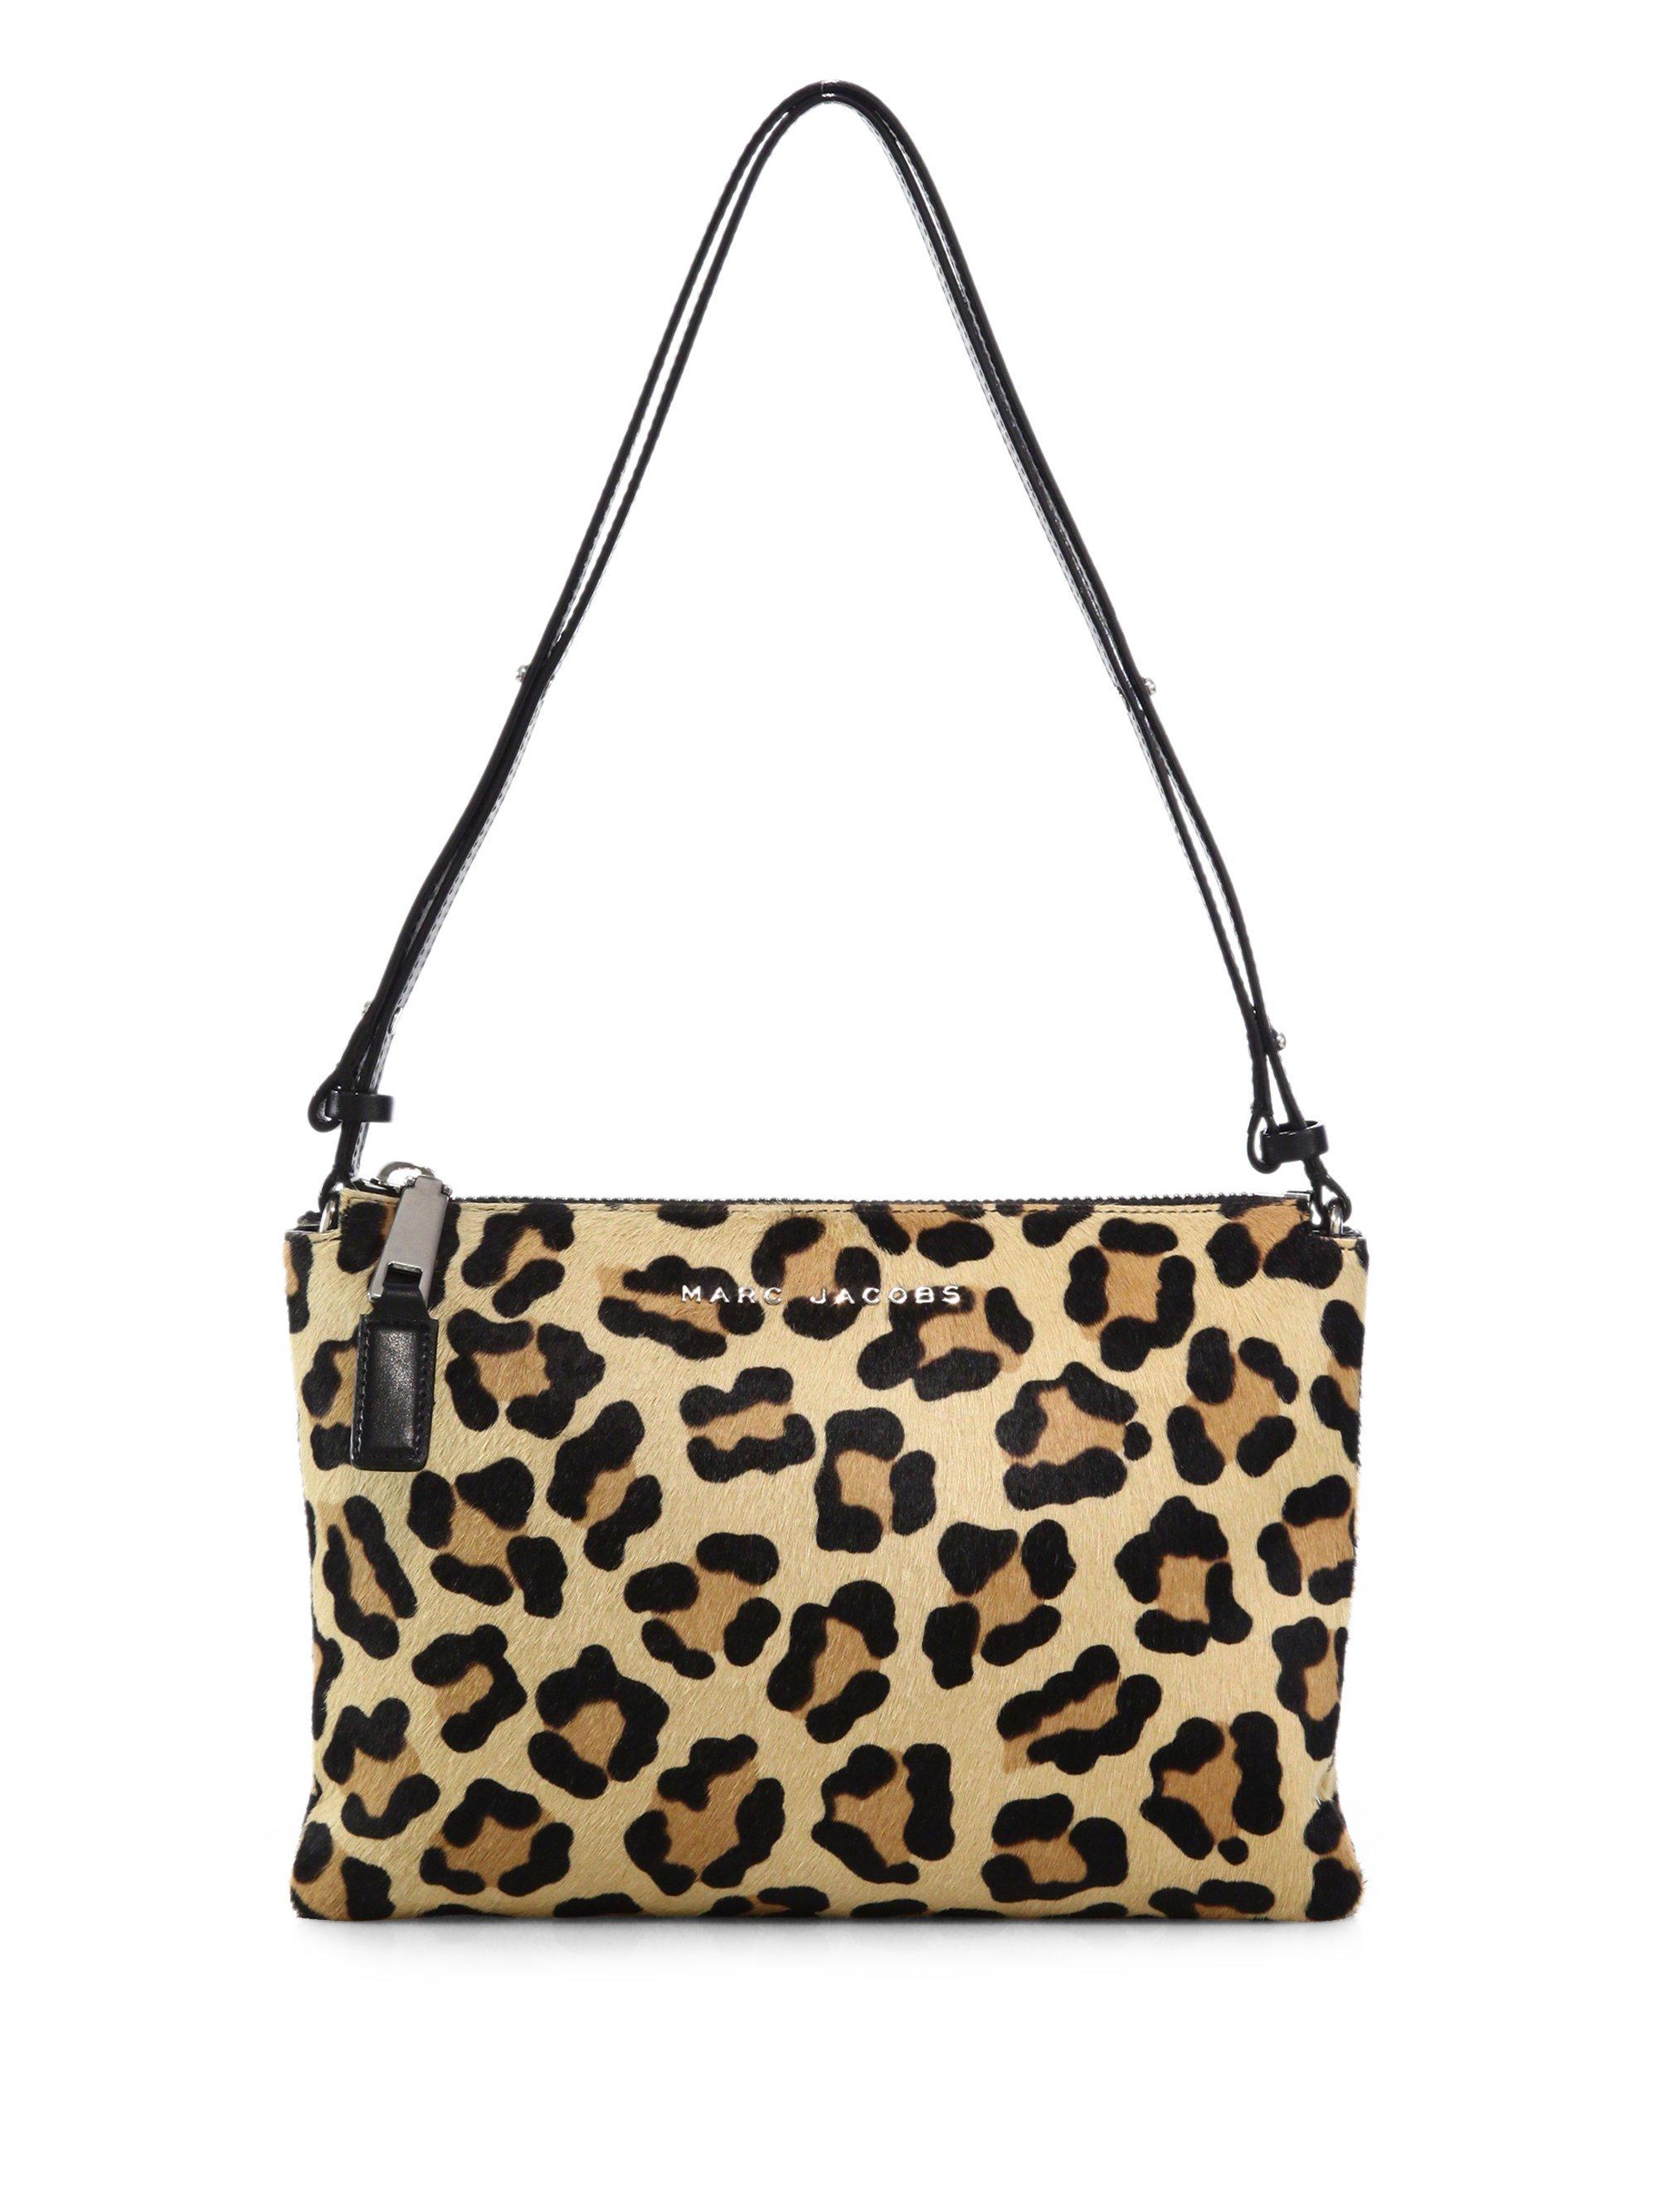 clearance coach leopard print crossbody bag dd443 093dc 2be453f85d608